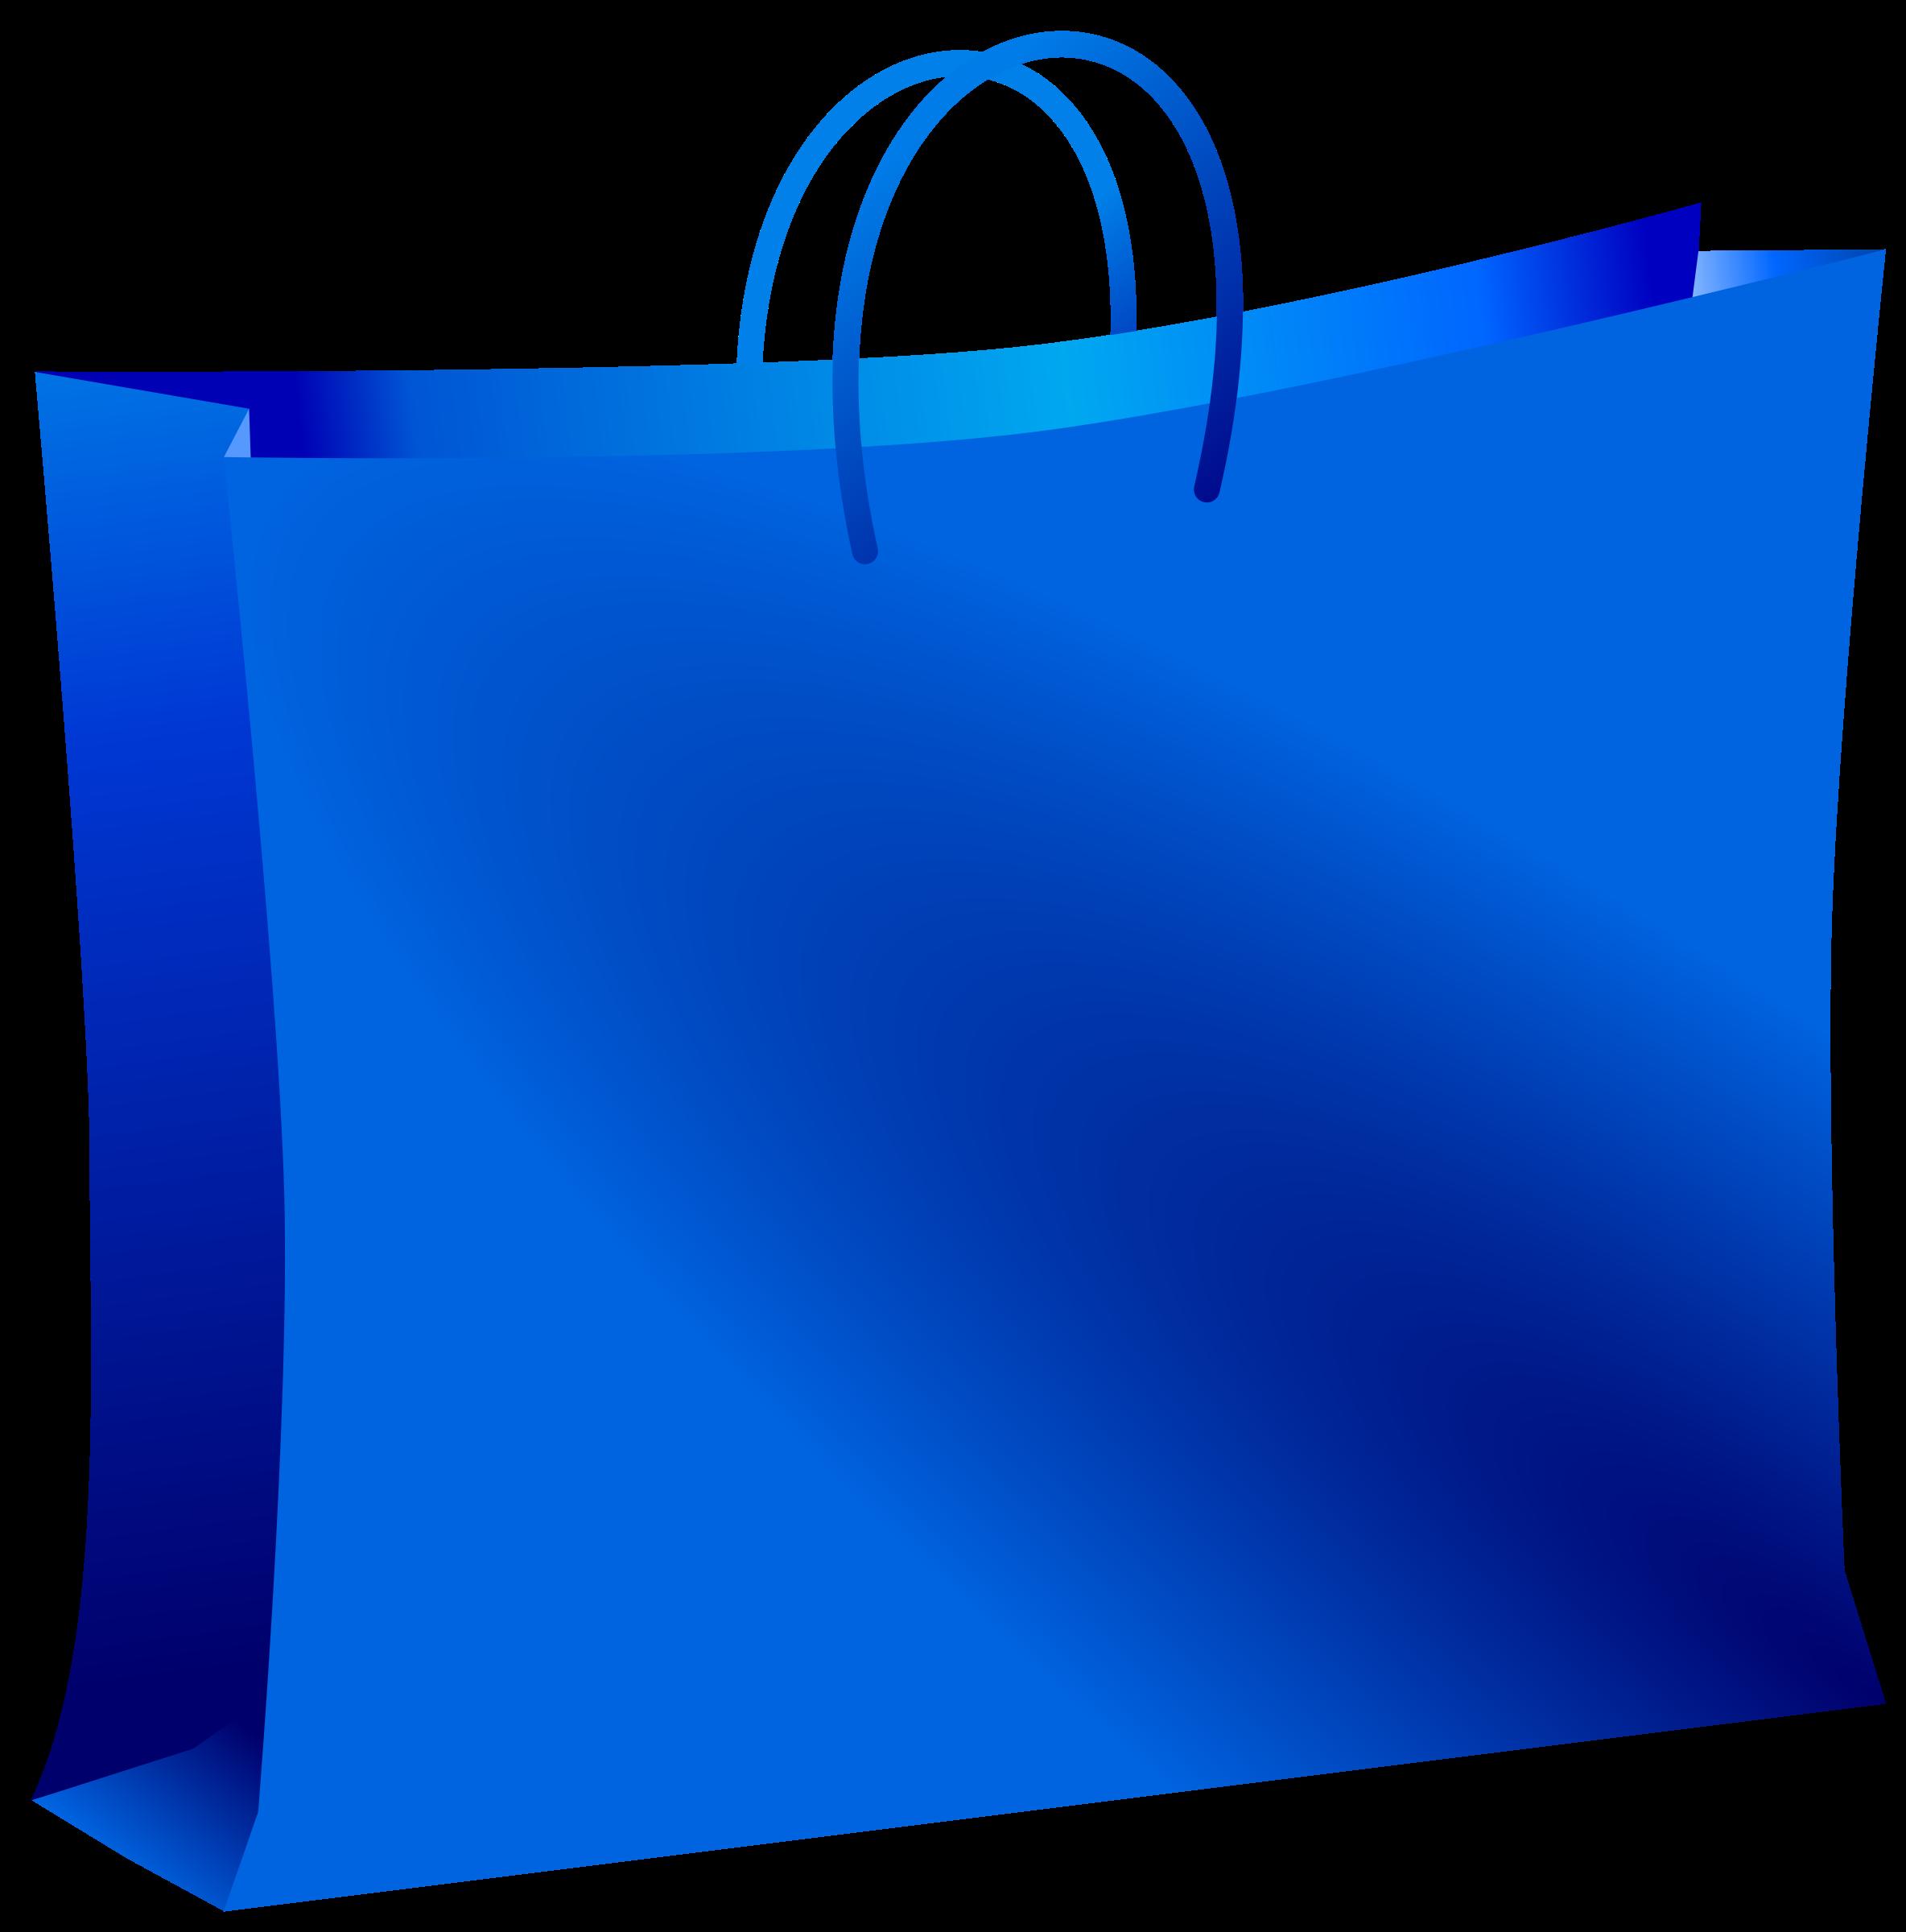 Bag clipart rectangle Bag Blue Clipart Blue bag